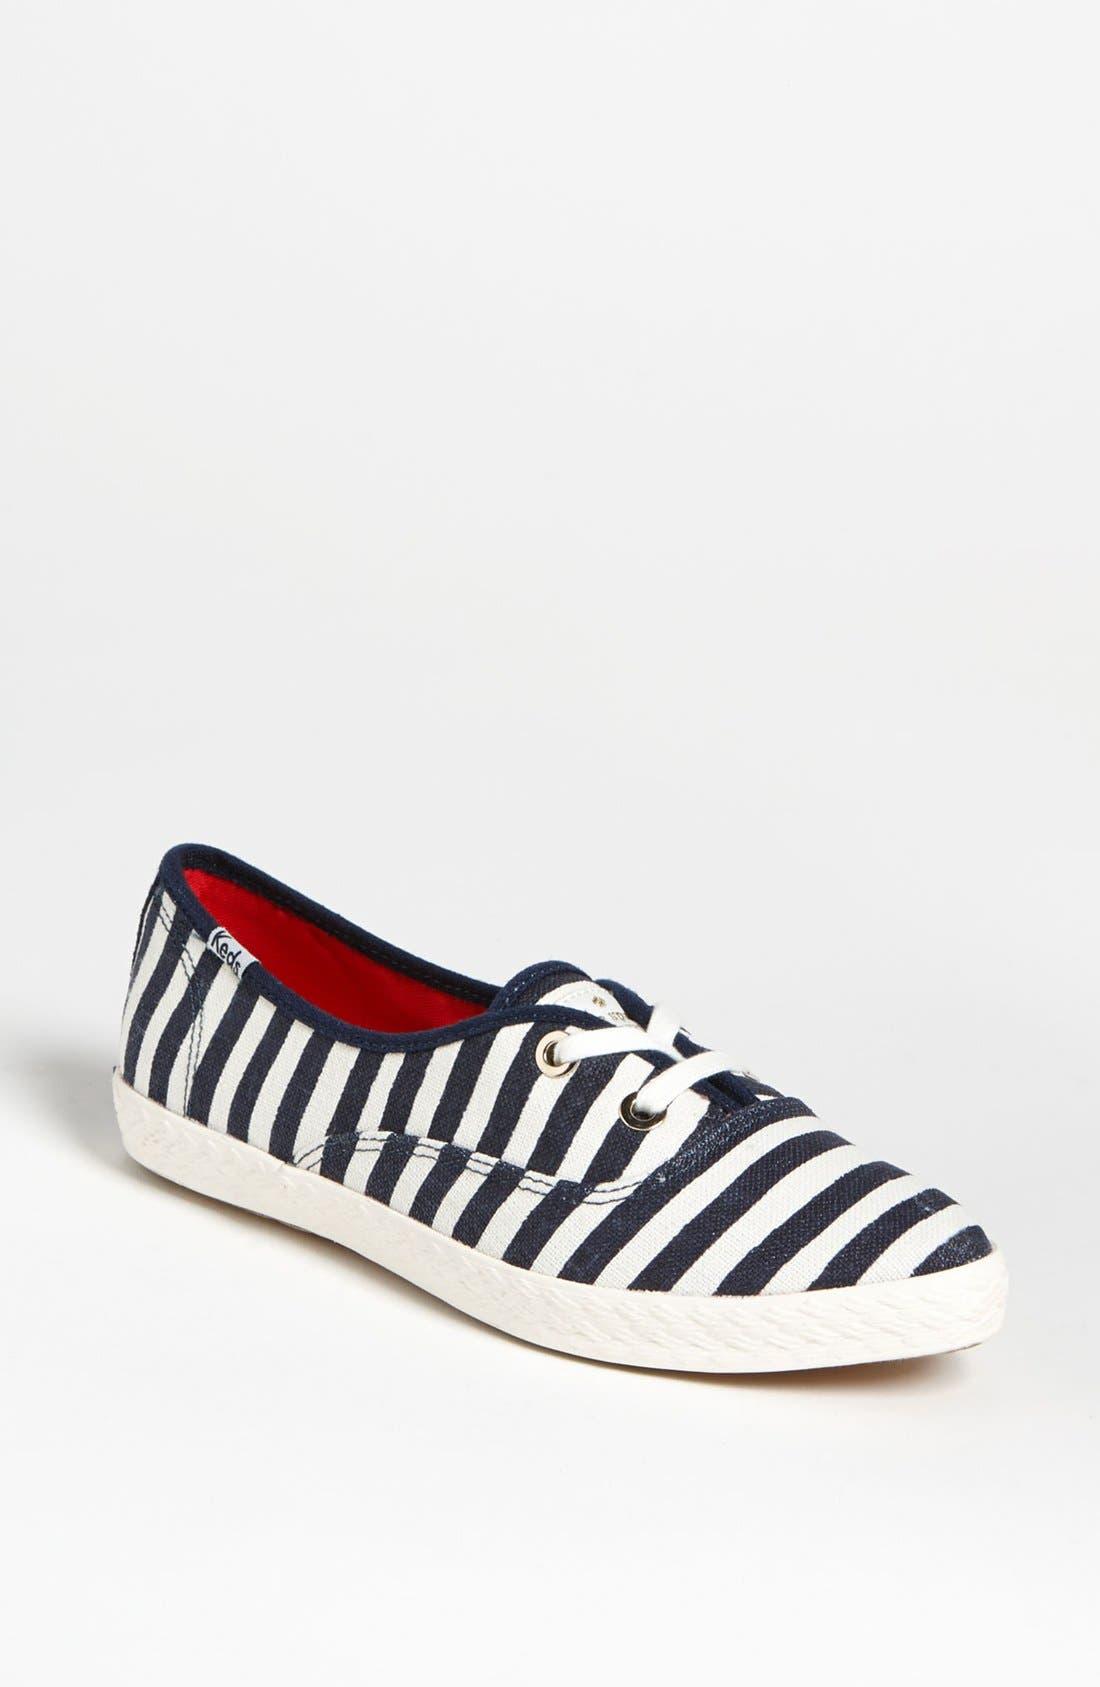 Main Image - Keds® for kate spade new york 'pointer' sneaker